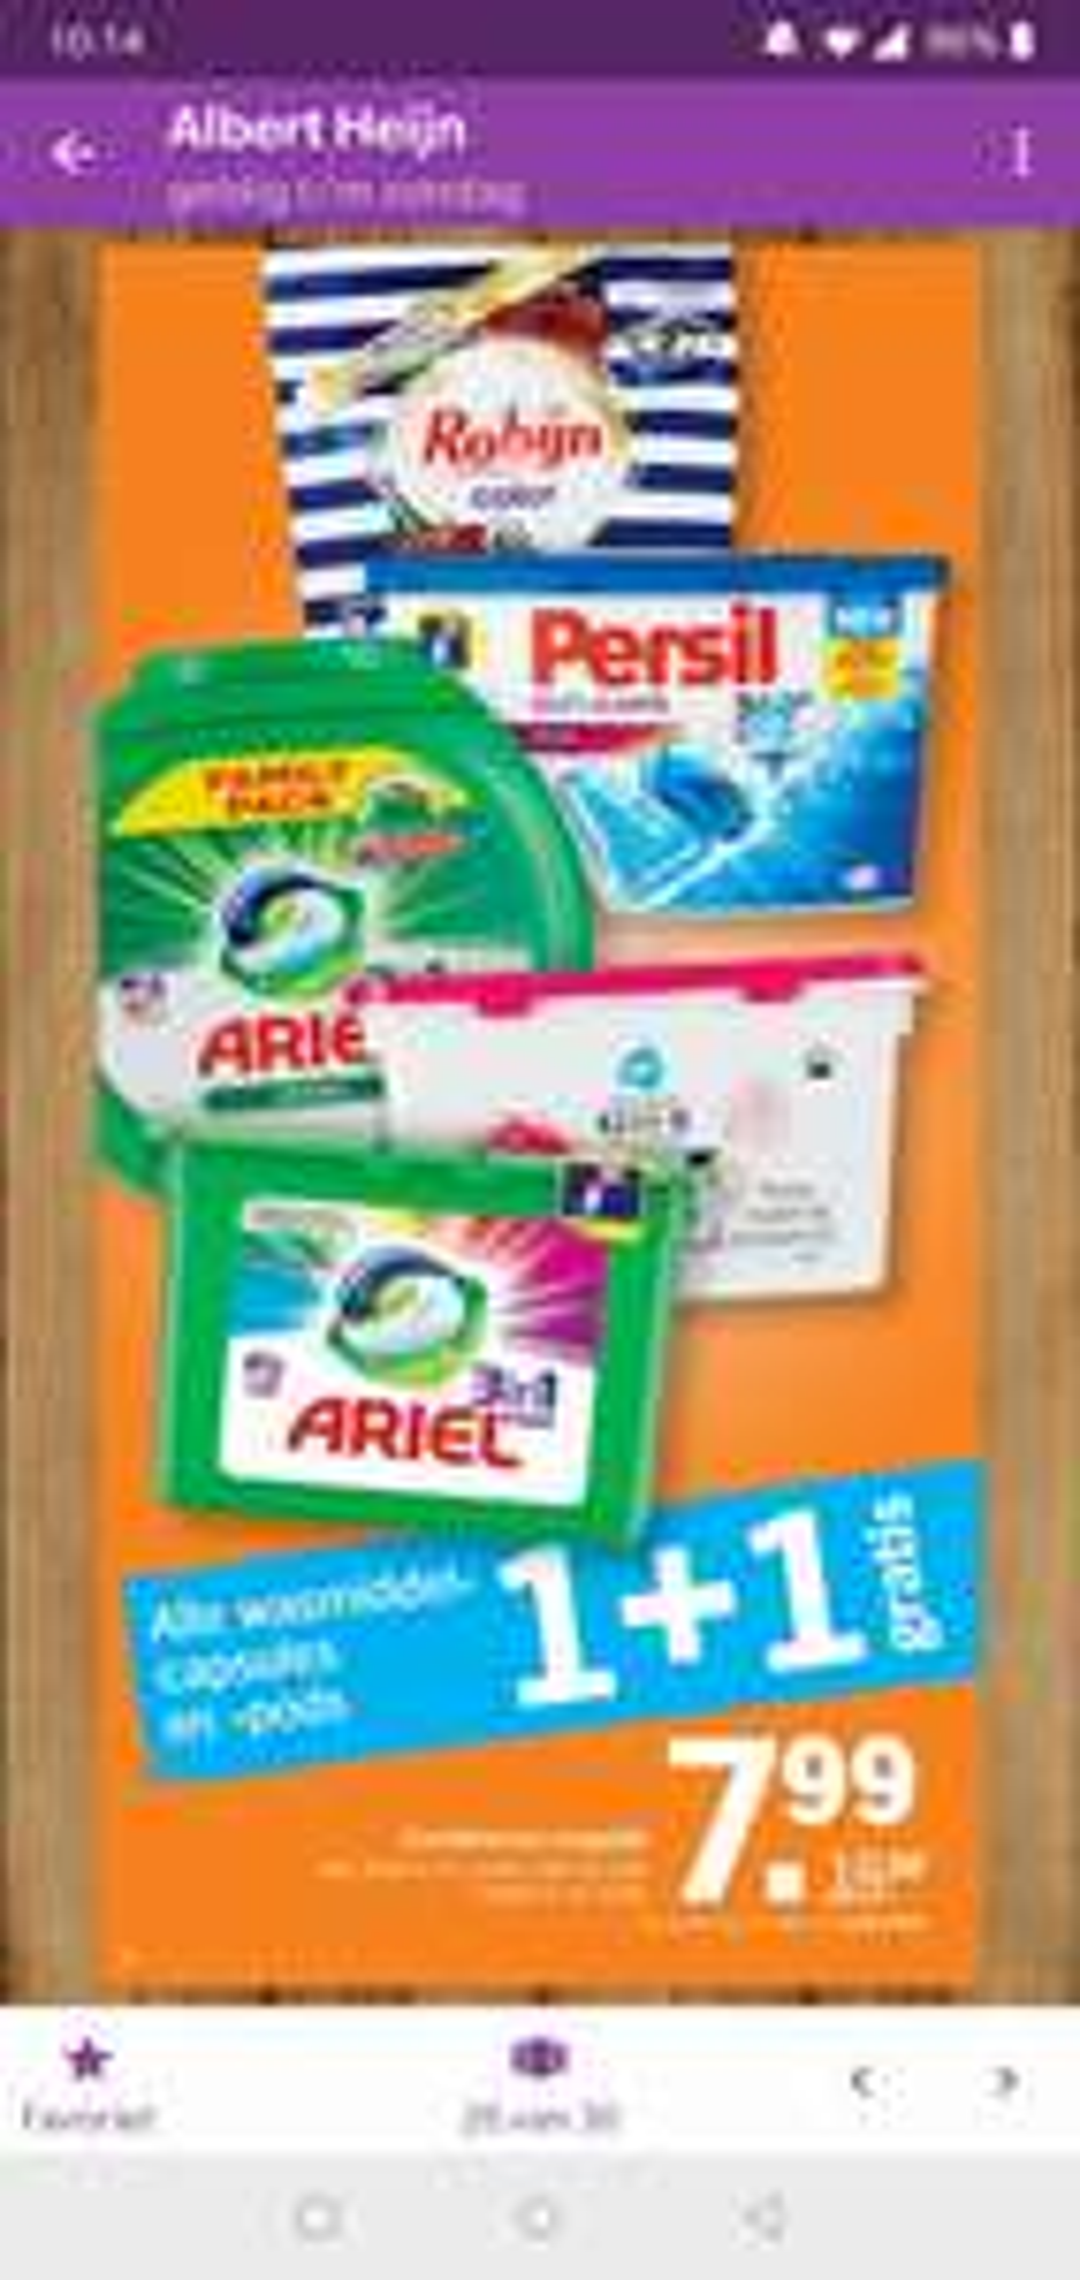 Alle wasmiddelcapsules en -pods 2e gratis